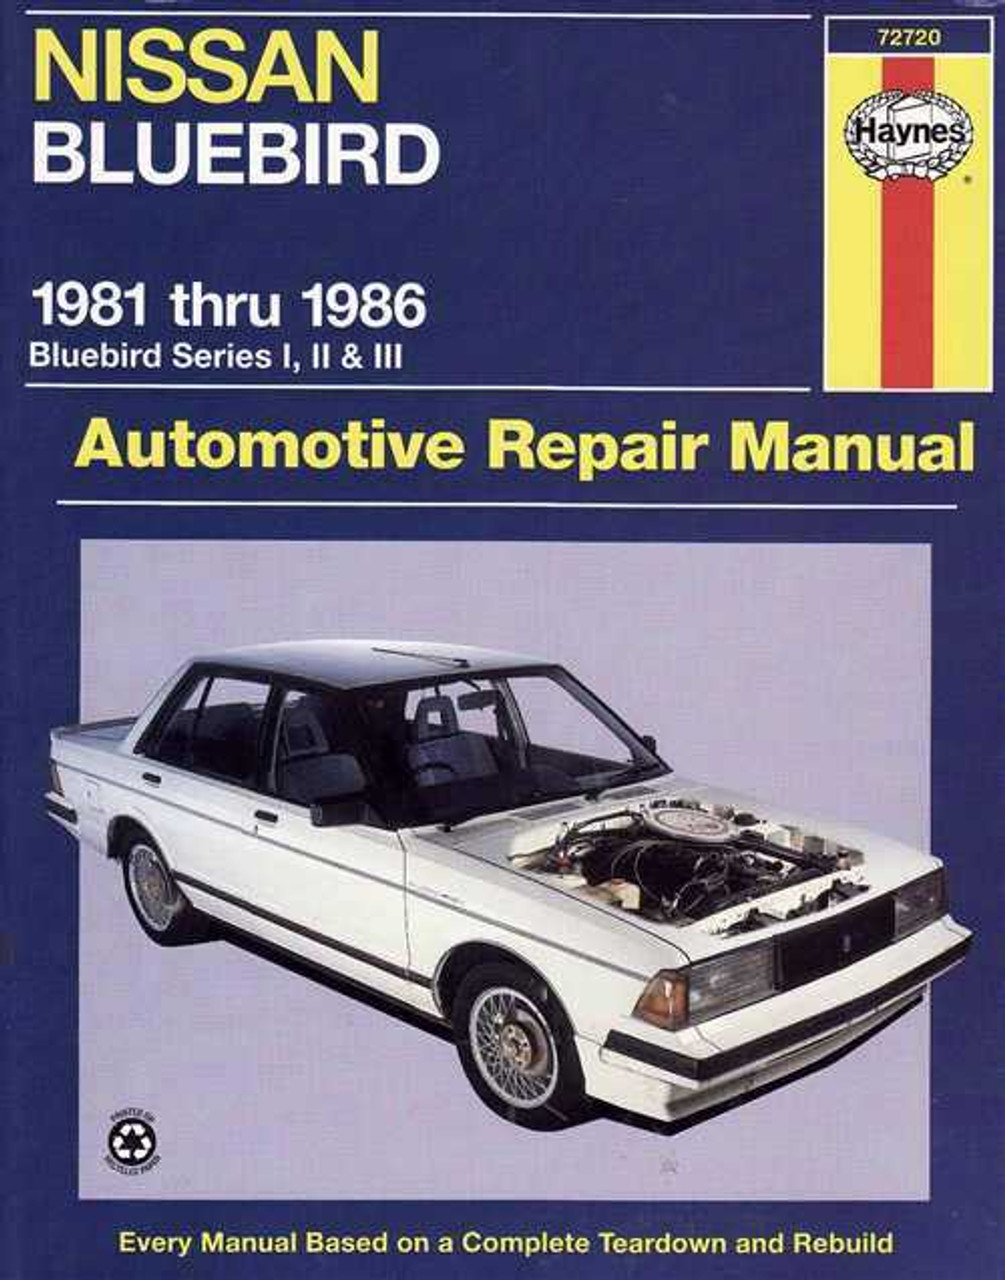 nissan bluebird series 1 2 amp 3 1981 1986 workshop manual rh automotobookshop com au 1995 Nissan Bluebird 1987 Nissan Bluebird